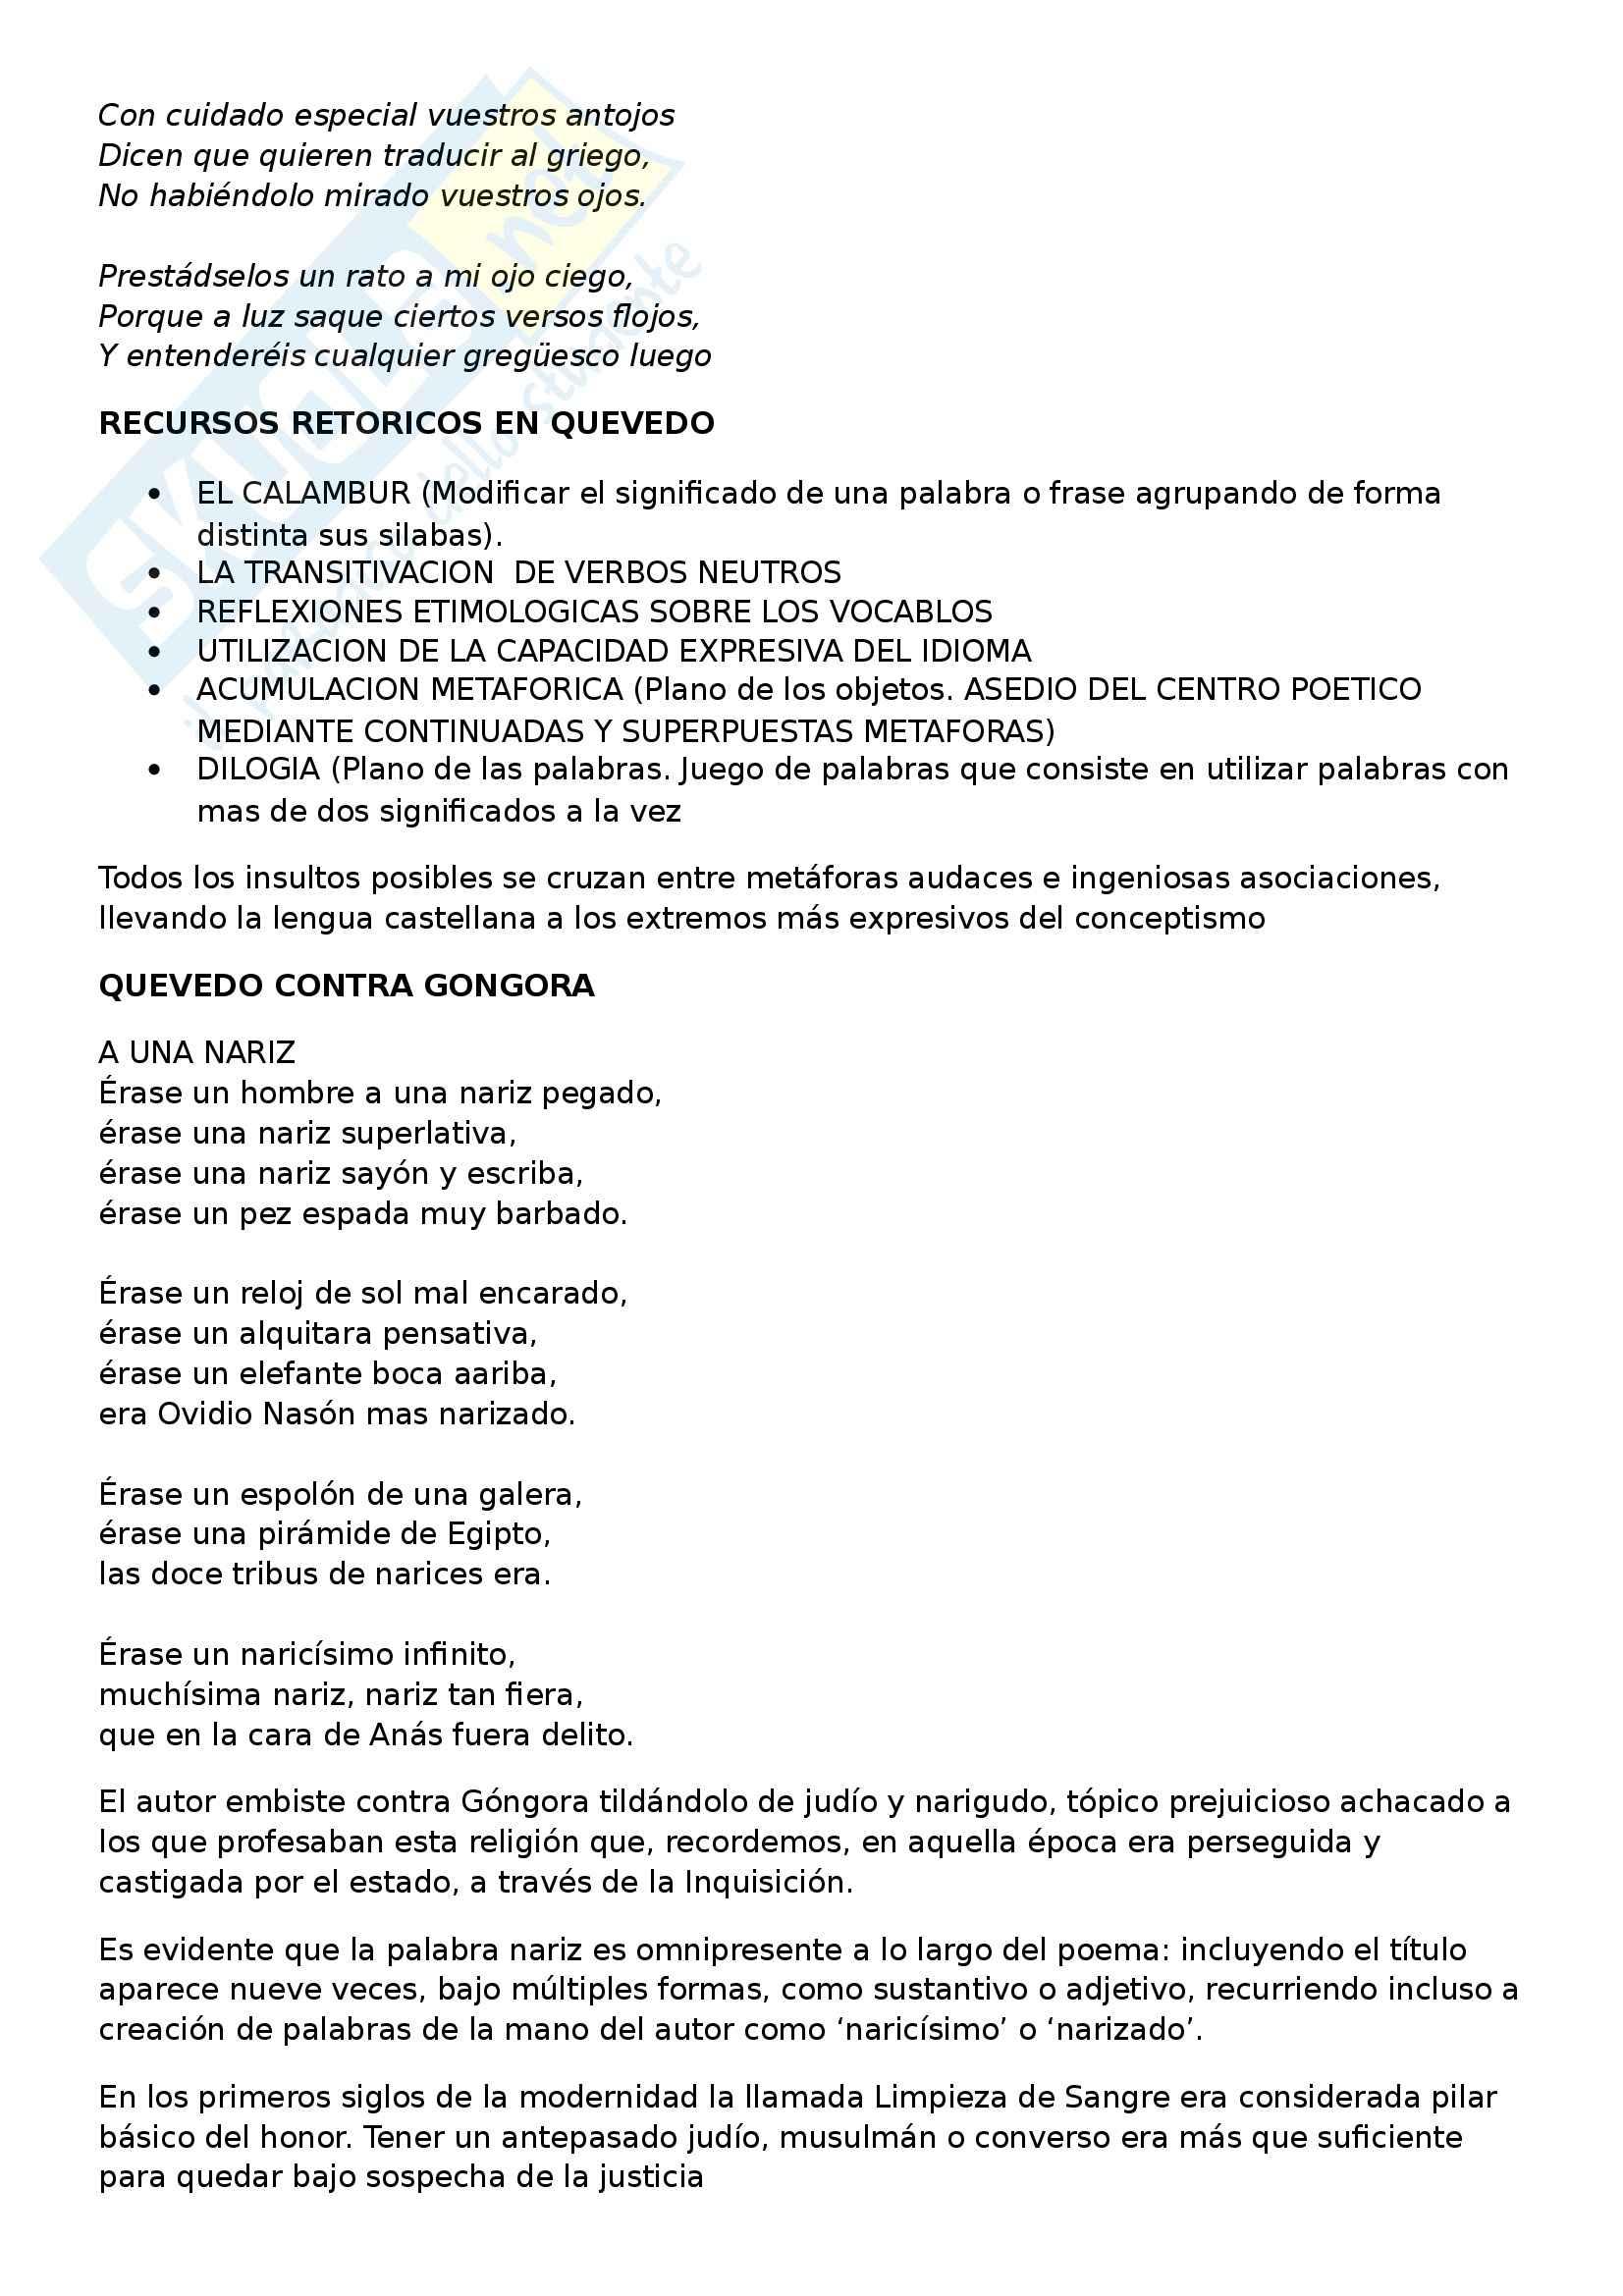 Letteratura spagnola - Quevedo vs Gongora Pag. 2